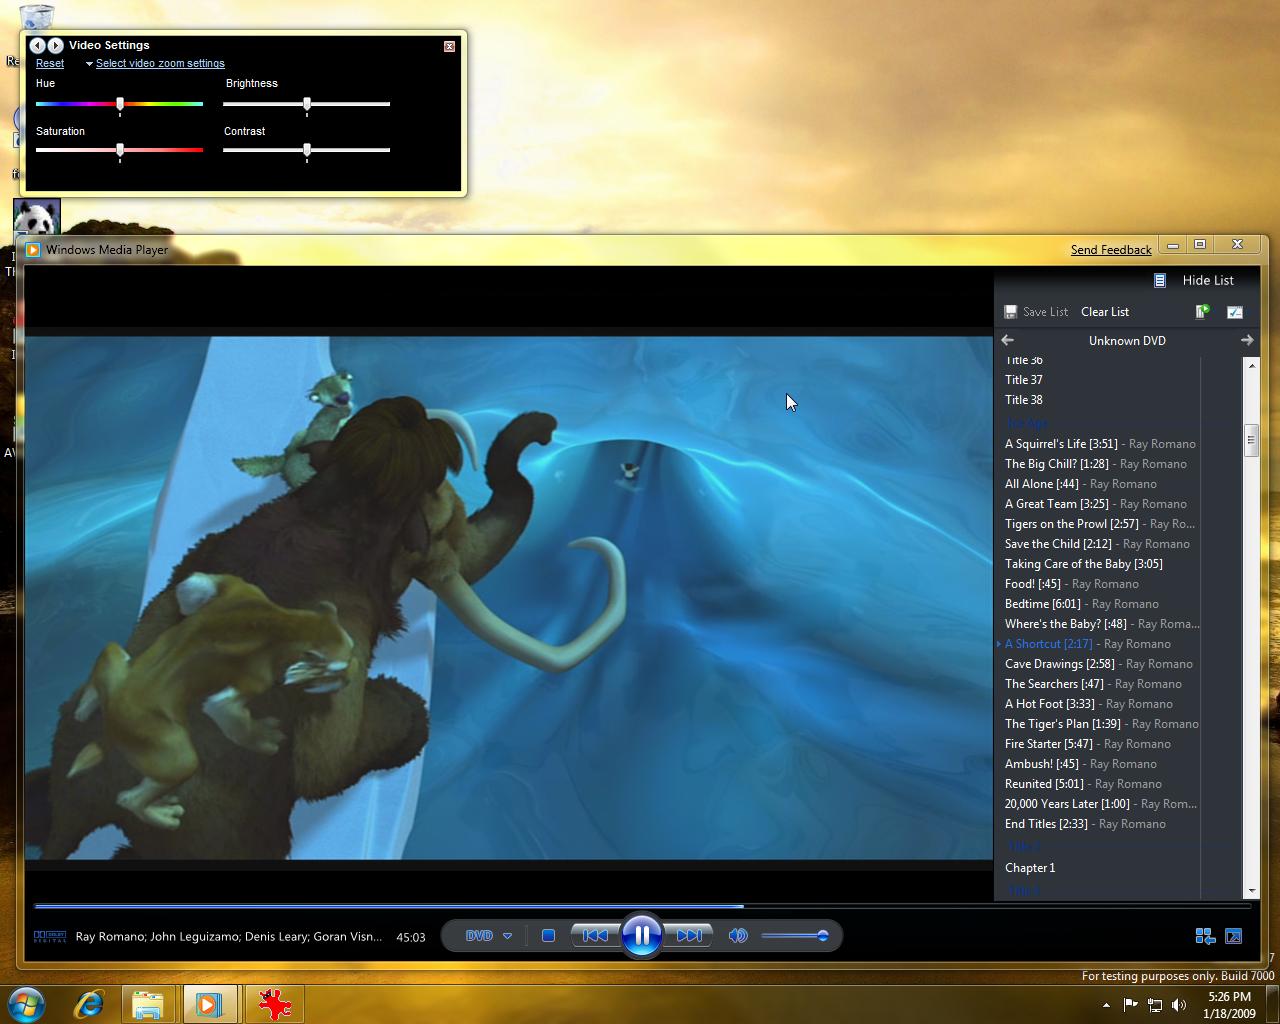 Windows 7 Beta - Windows Media Player 12